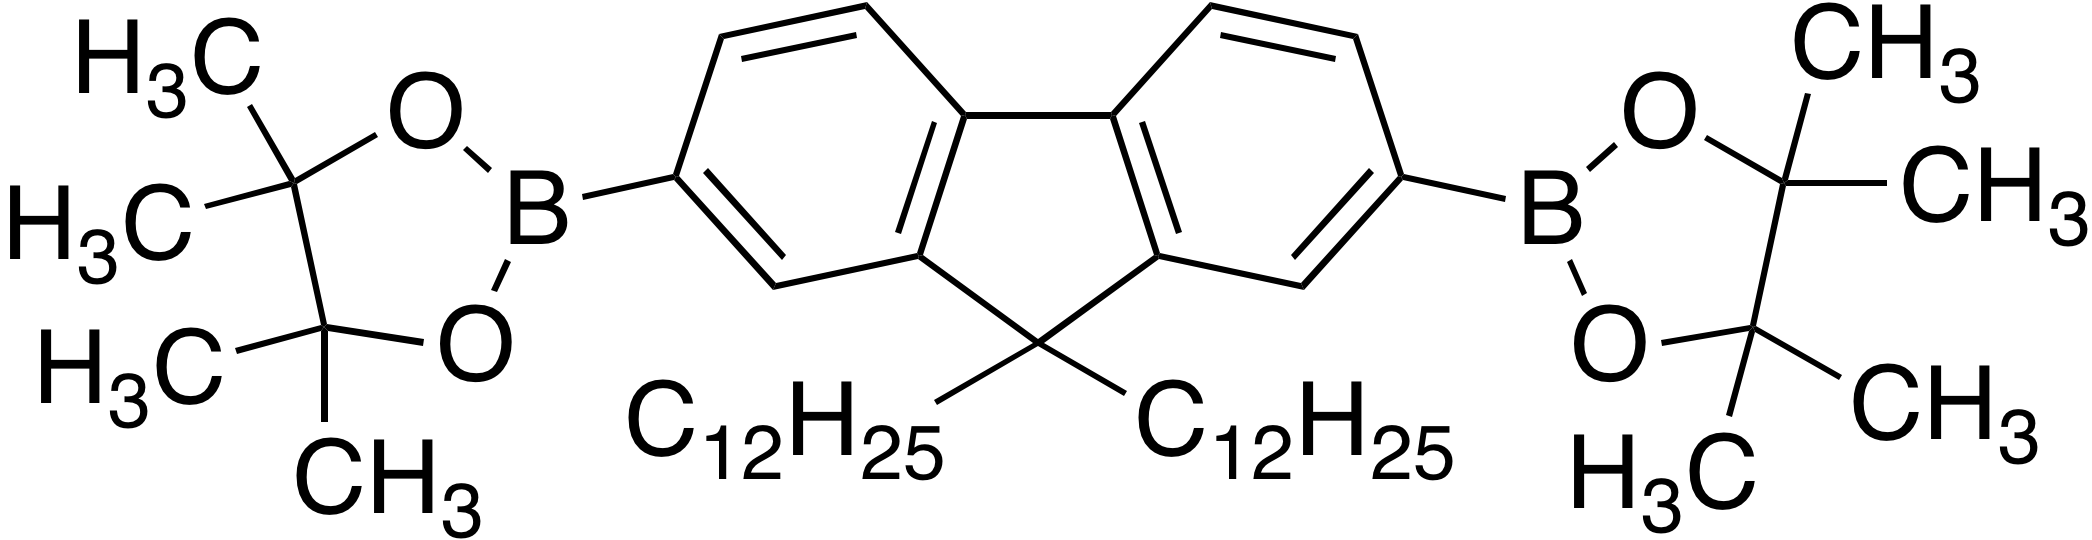 9,9-Didodecyl-9H-fluorene-2,7-diboronic acid pinacol ester